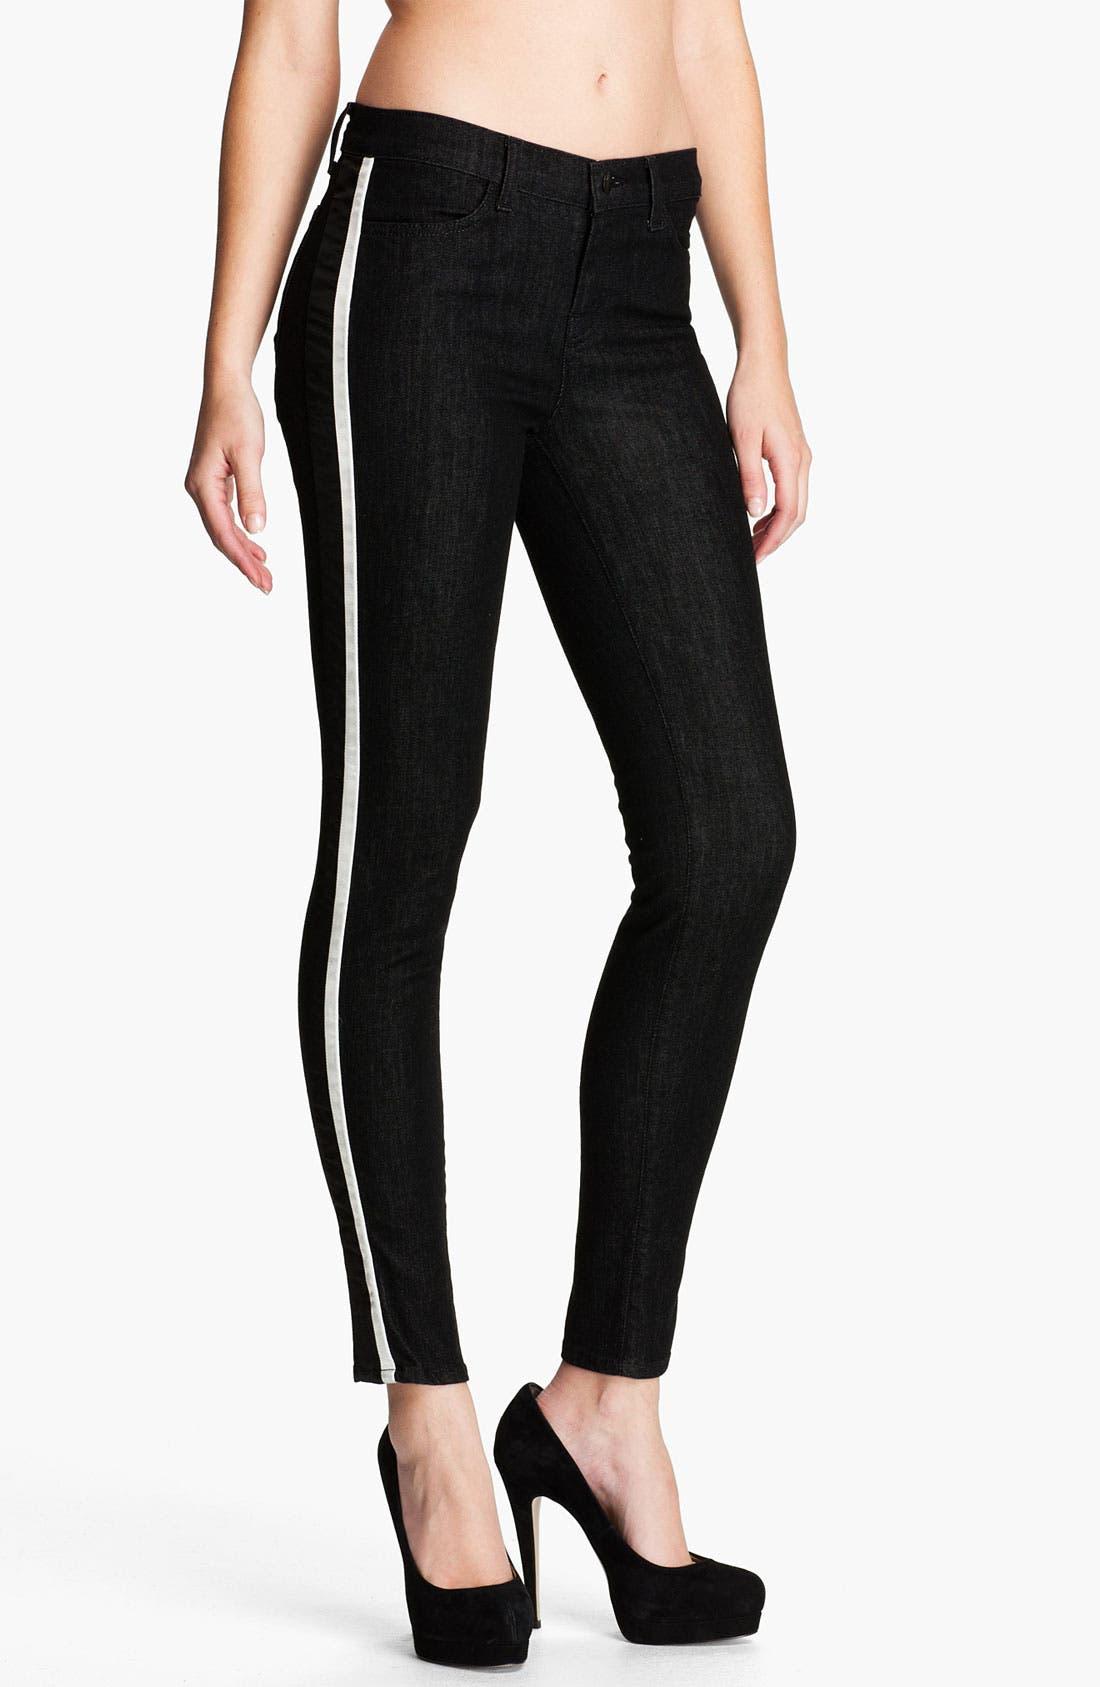 Alternate Image 1 Selected - J Brand 'Rowan' Stripe Skinny Jeans (Tux)